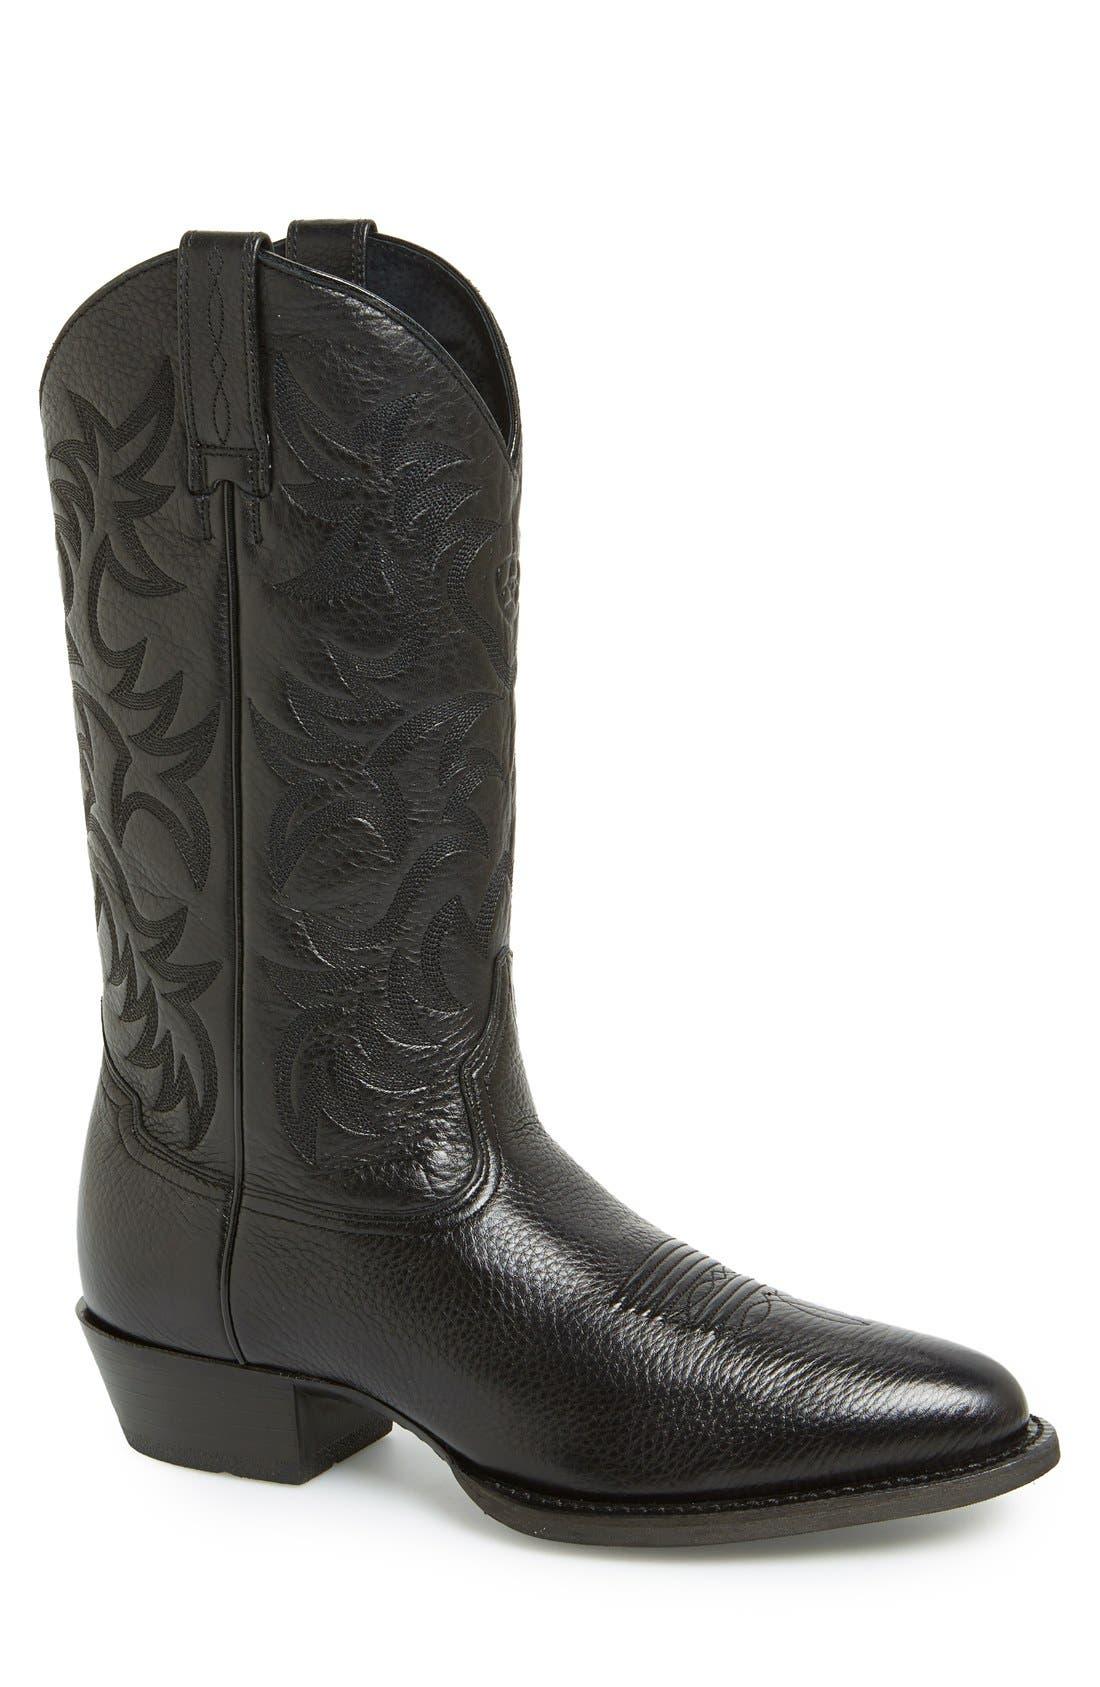 'Heritage' Leather Cowboy R-Toe Boot,                         Main,                         color, BLACK DEERTAN